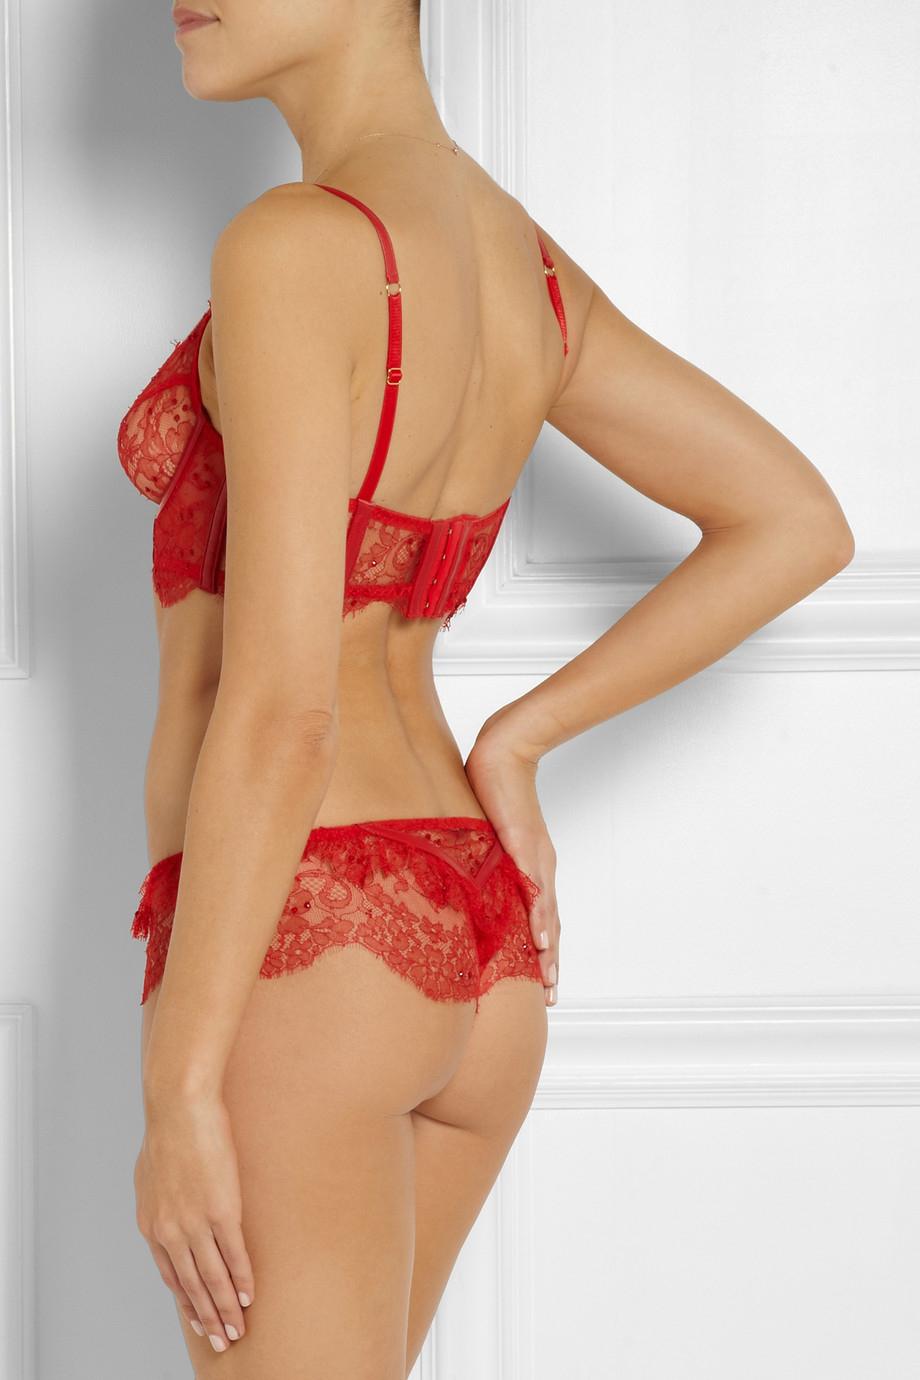 Agent provocateur Soirée Adara Embellished Stretch-Lace ...